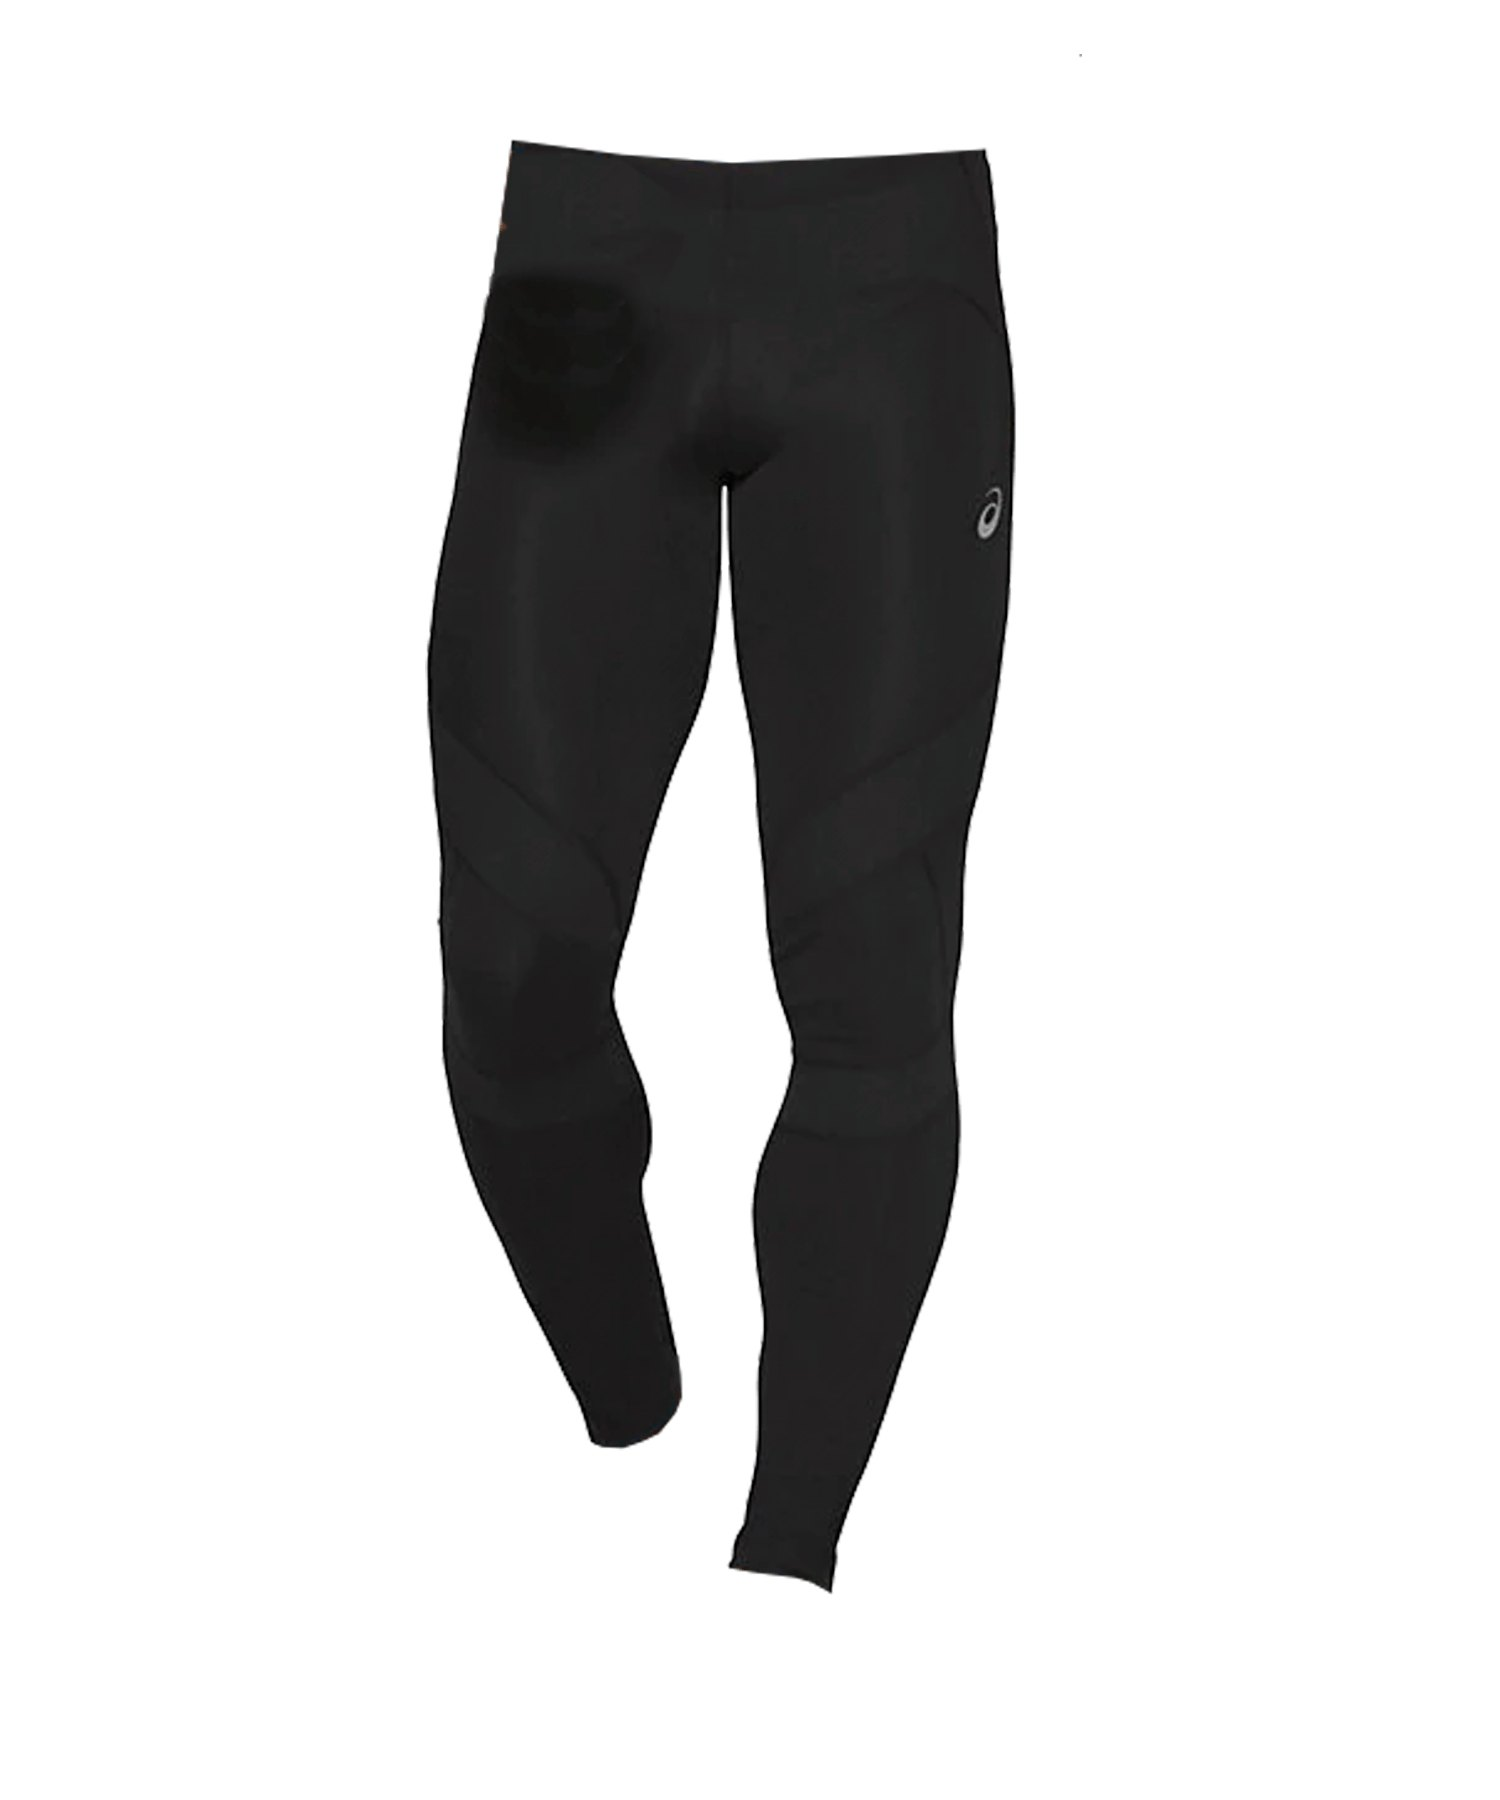 Asics Leg Balance Tight 2 Laufhose Running F008 - schwarz